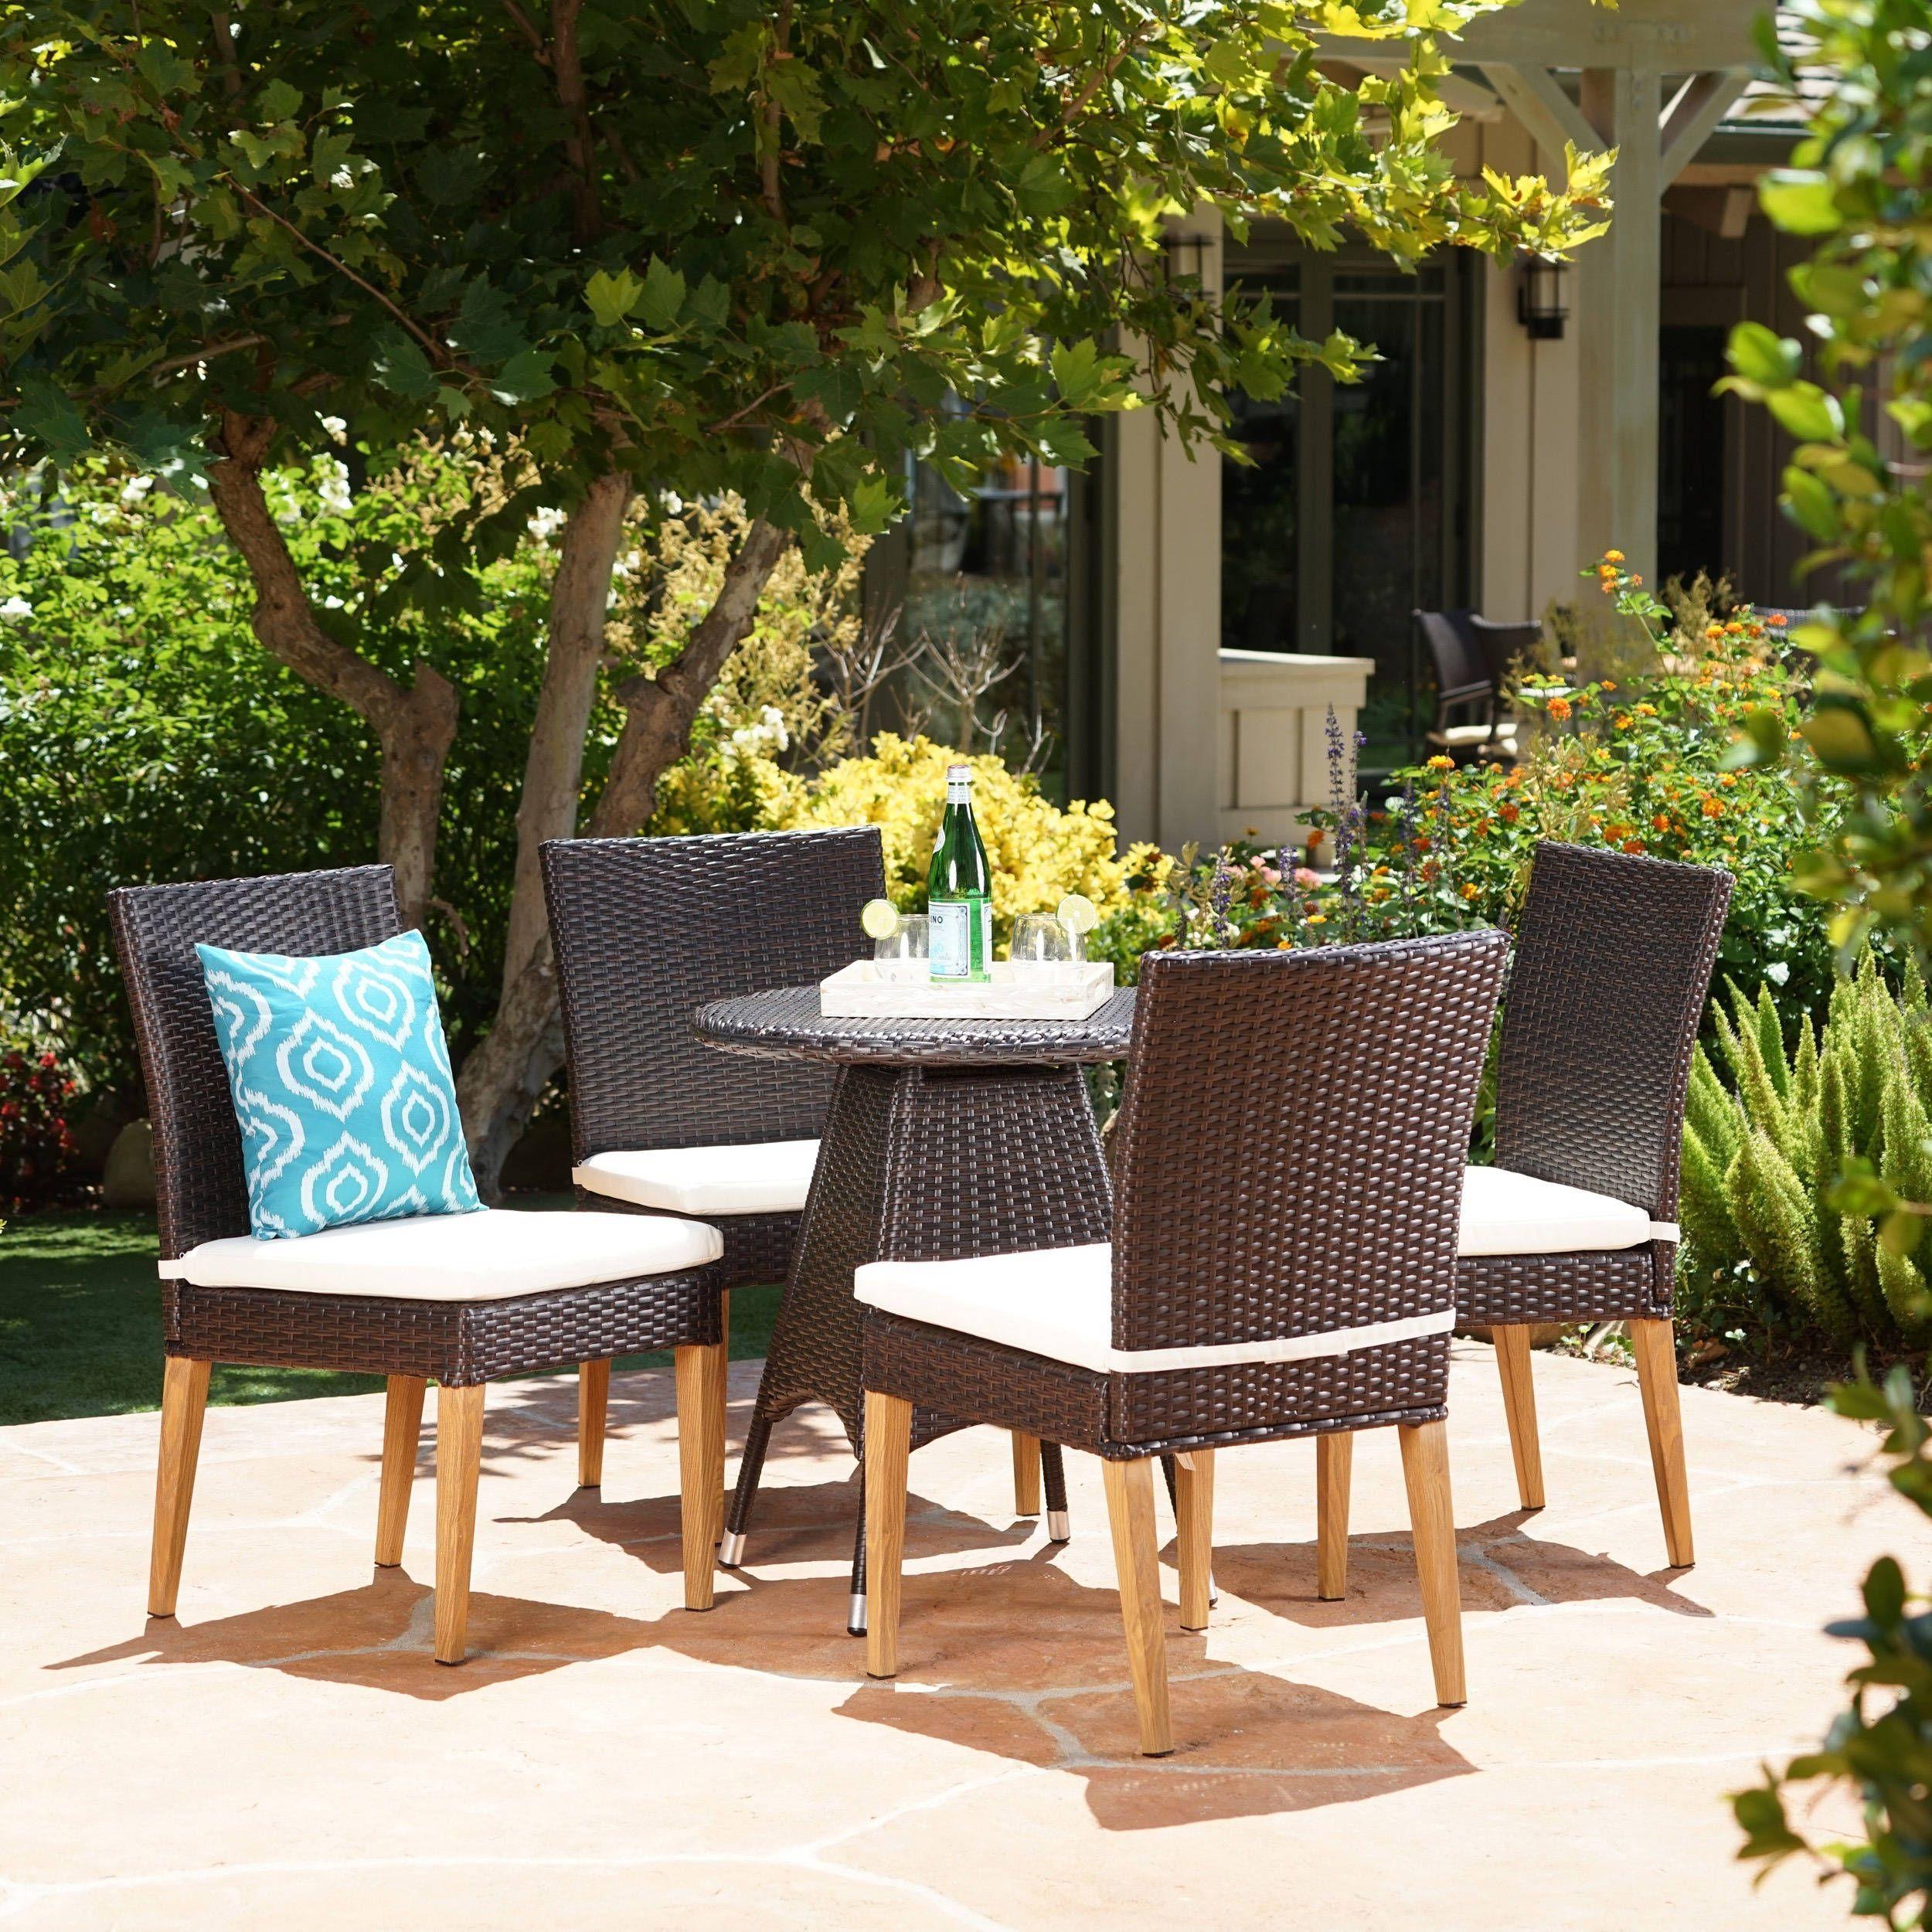 Santa Barbara Outdoor 5-Piece Round Wicker Dining Set With